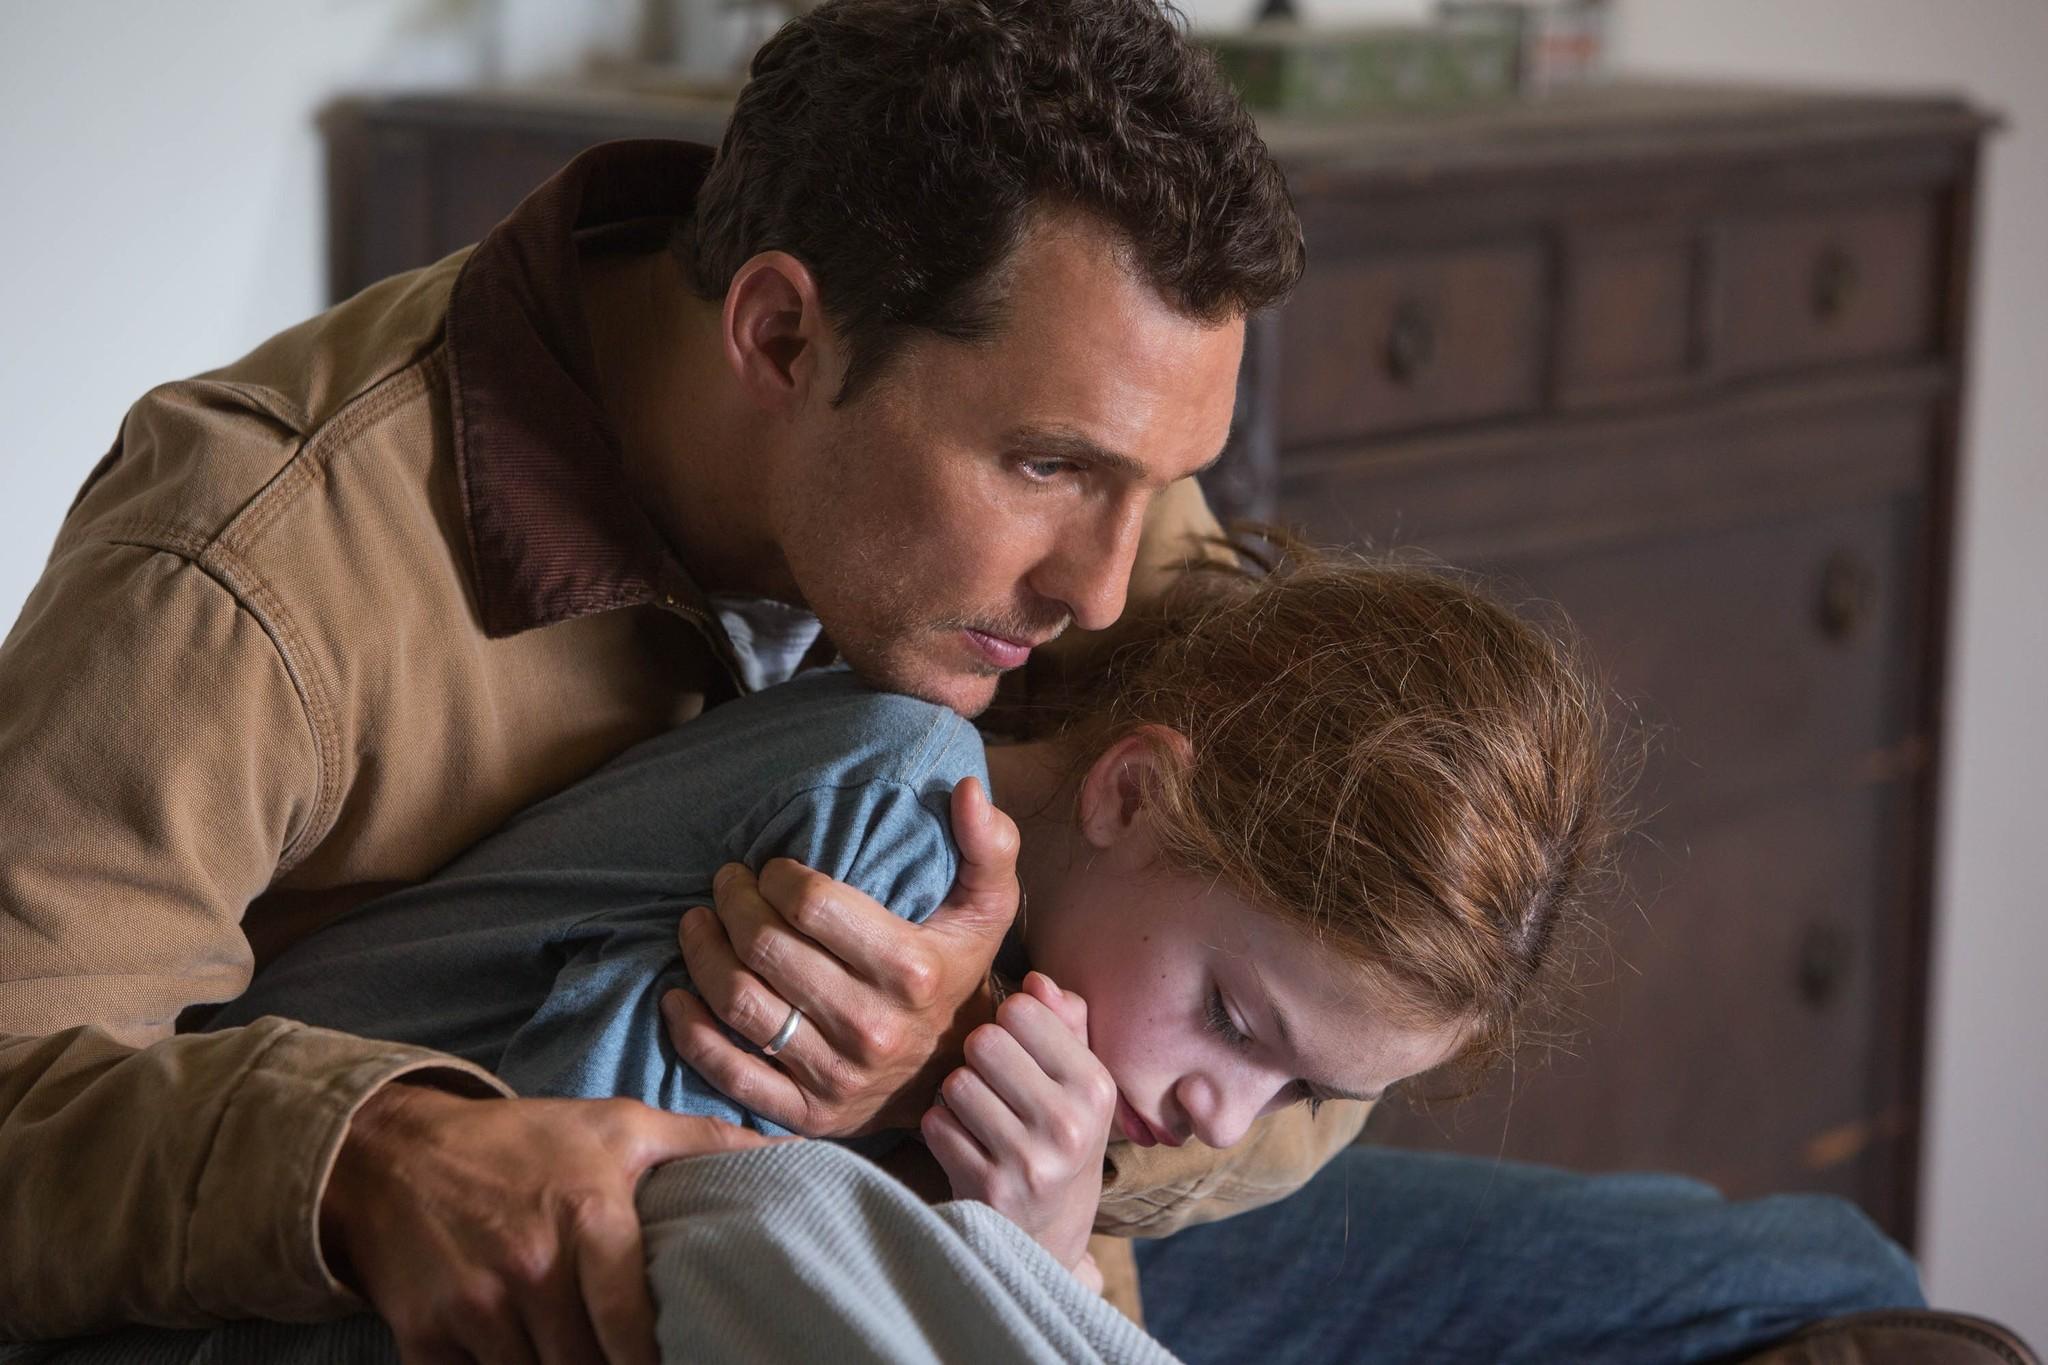 Matthew McConaughey and Mackenzie Foy in a scene from